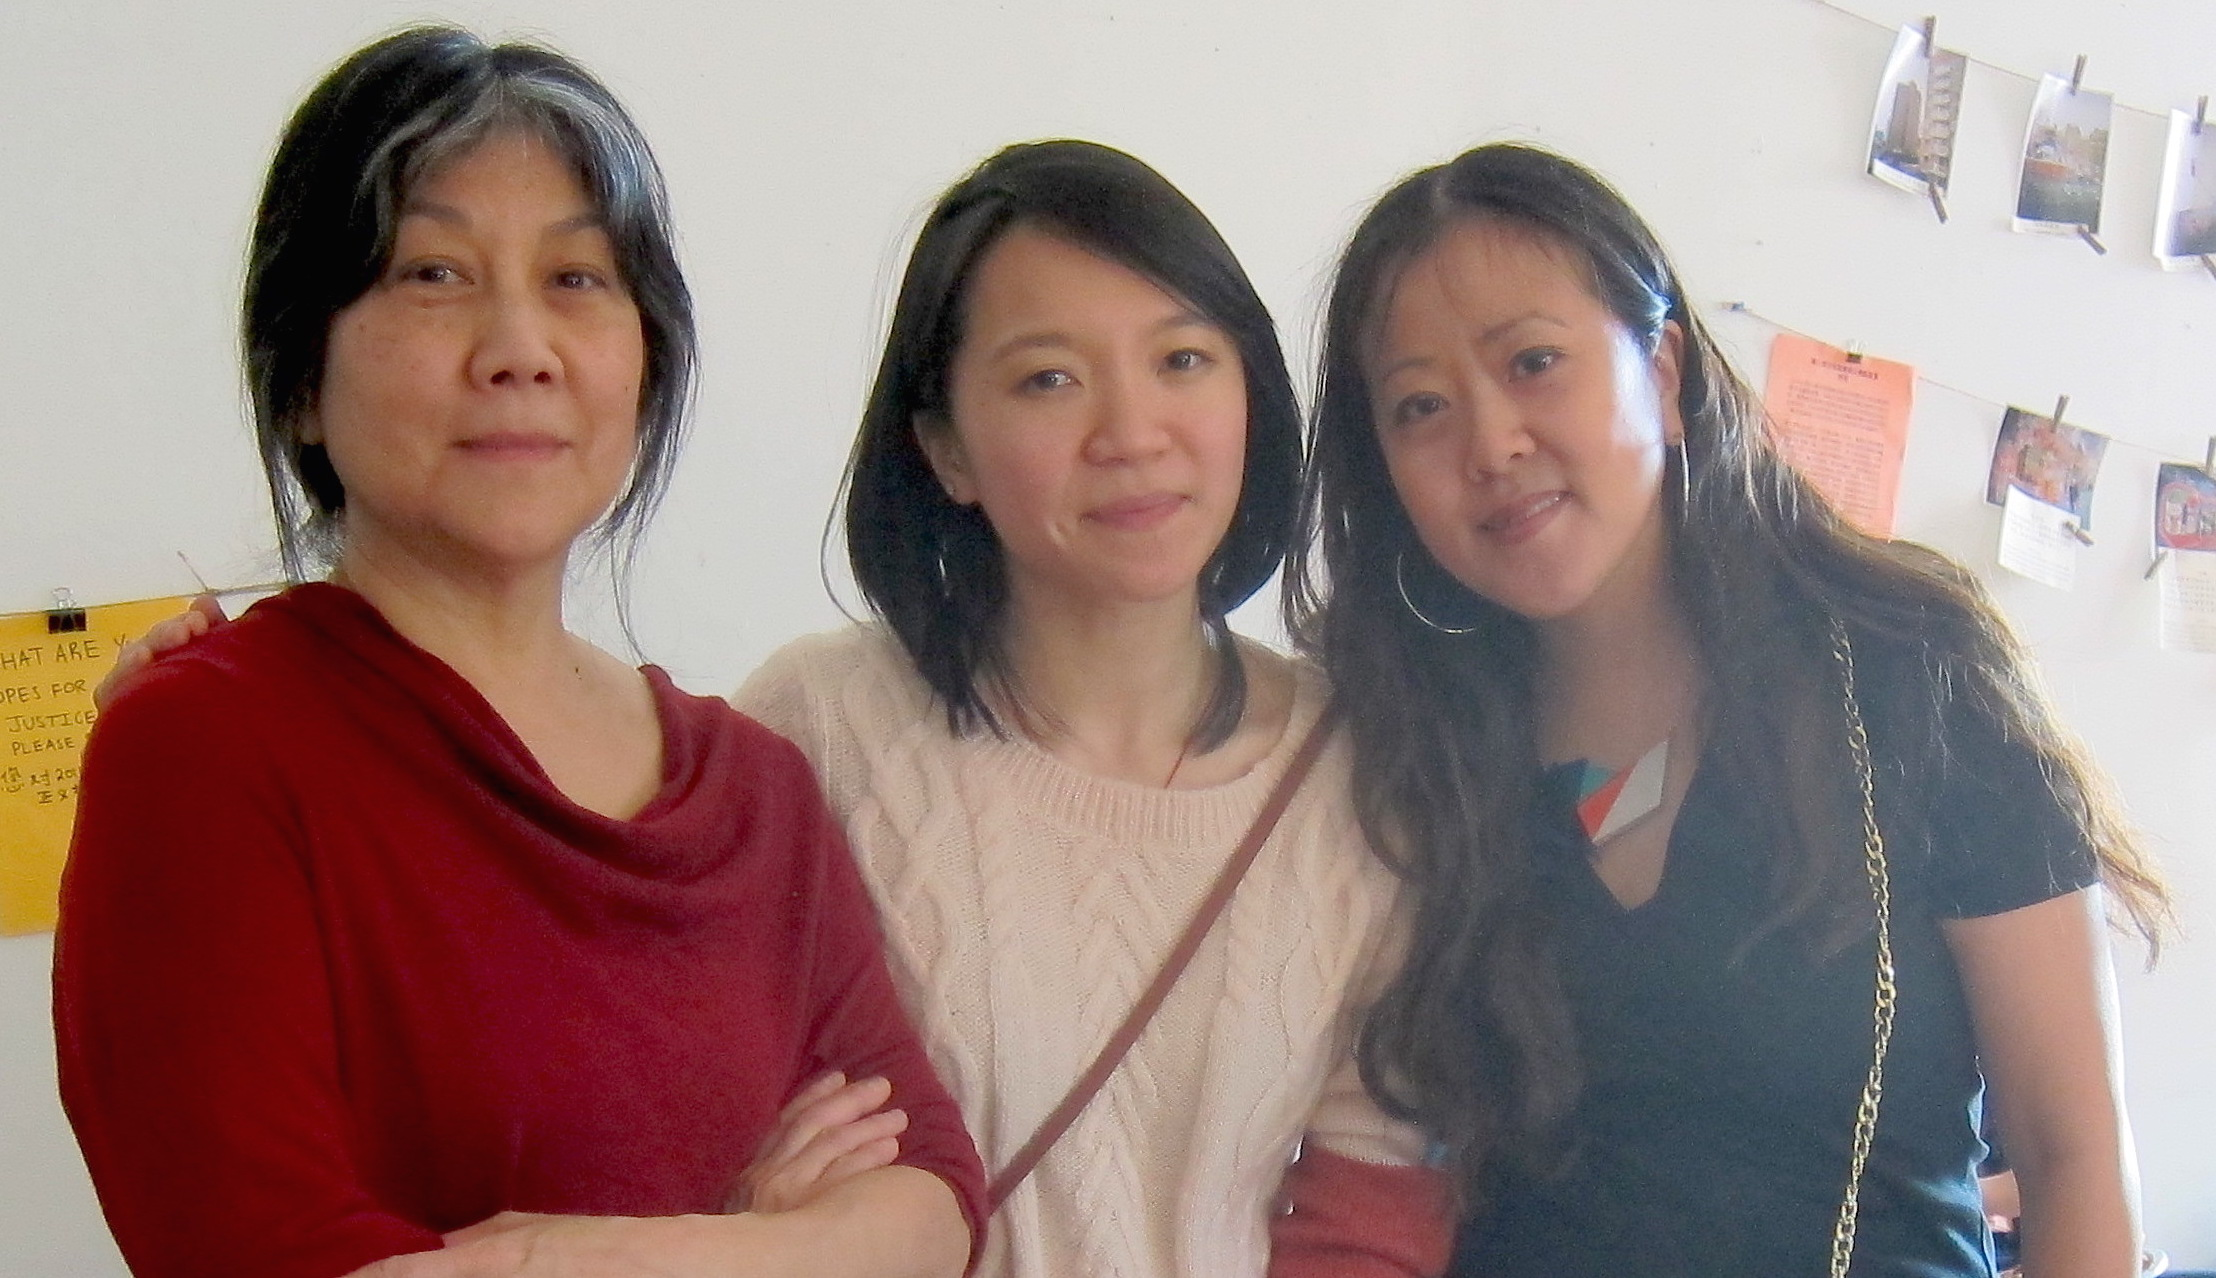 Tomie Arai, ManSee Kong and Betty Yu, co-founding members of Chinatown Art Brigade